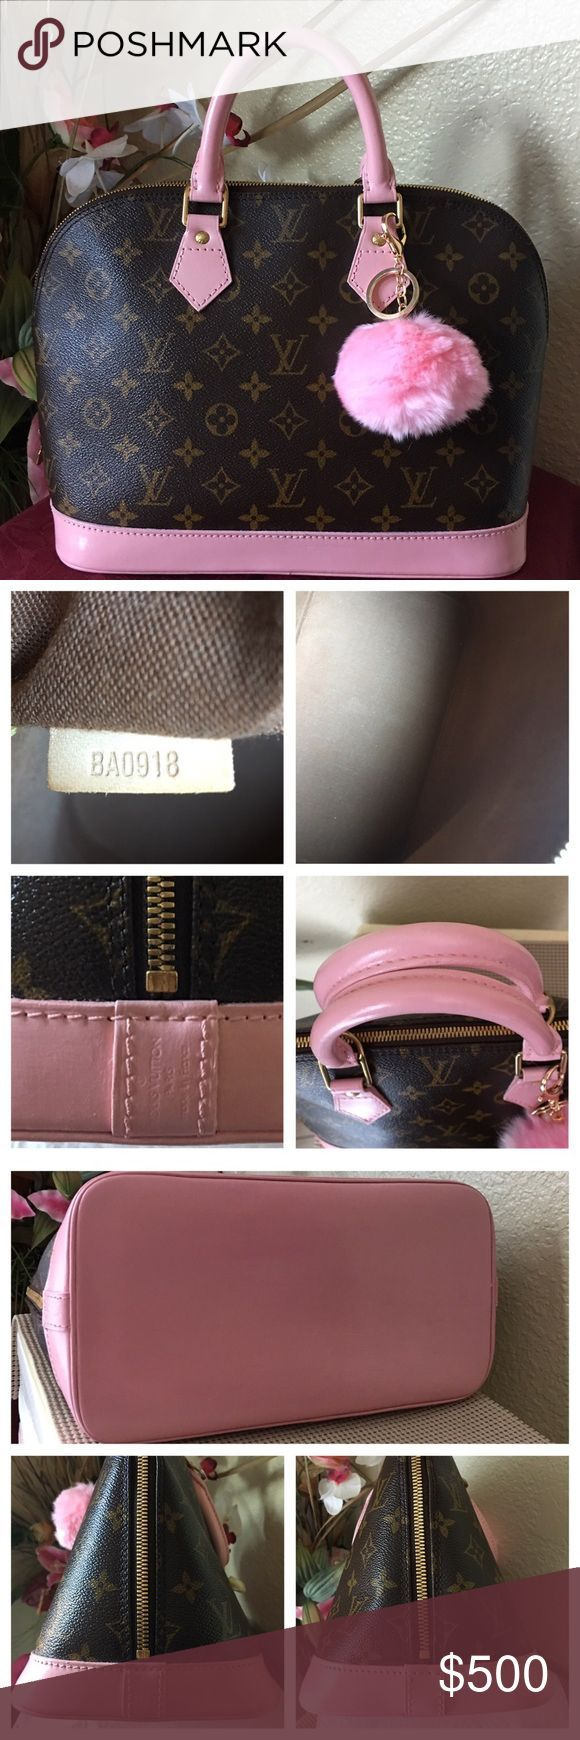 Spotted while shopping on Poshmark  SOLD! Authentic Louis Vuitton Alma PM!   poshmark 3e1c3e9d01